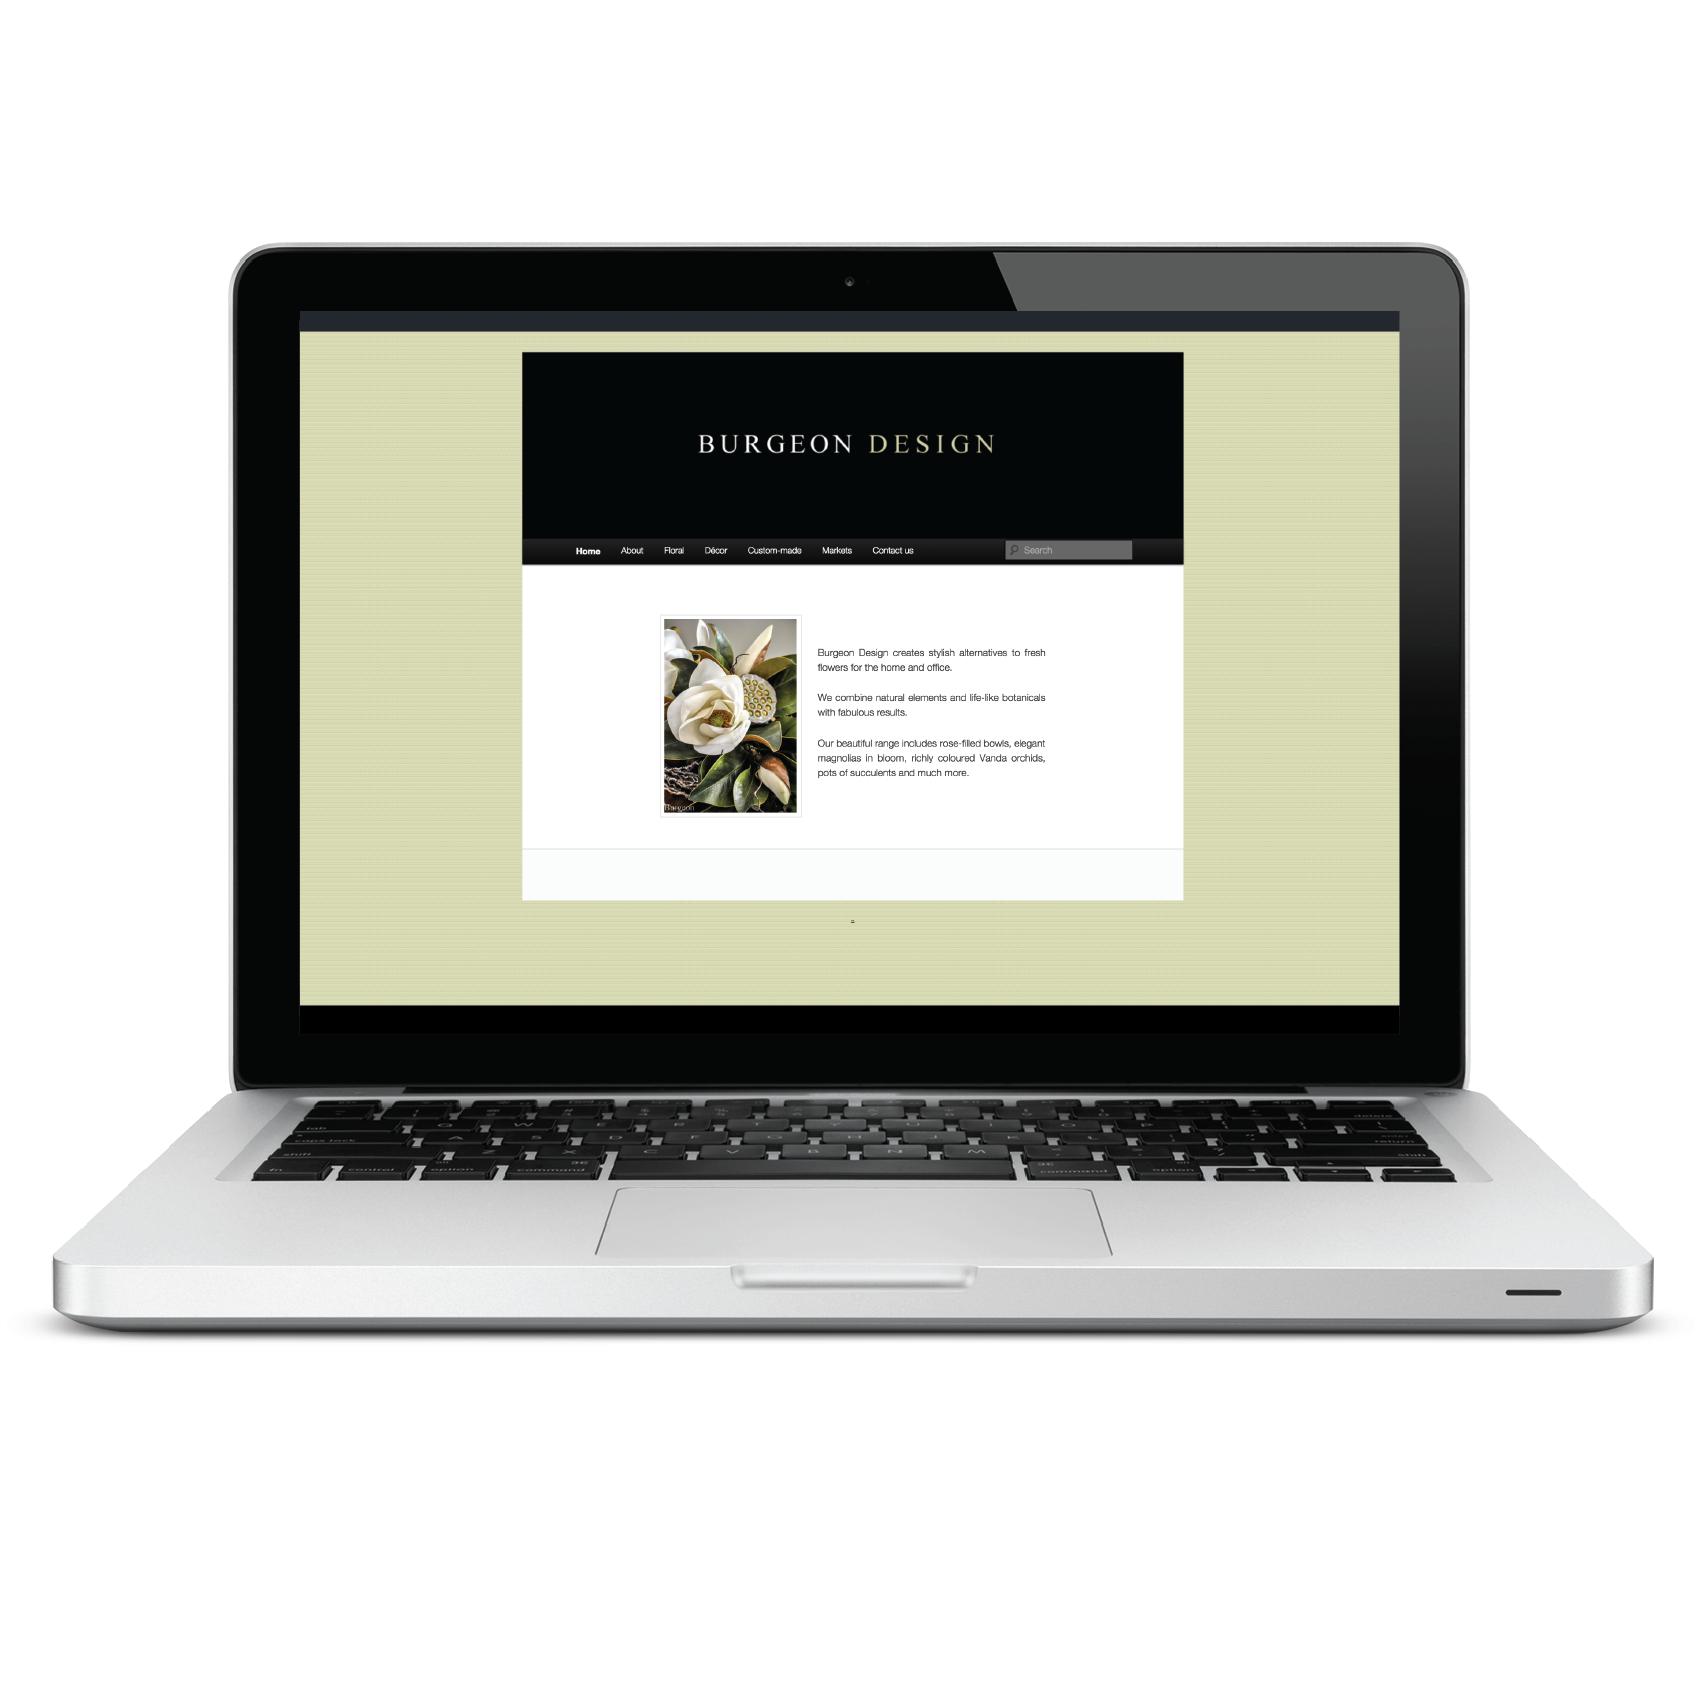 Burgeon Design web